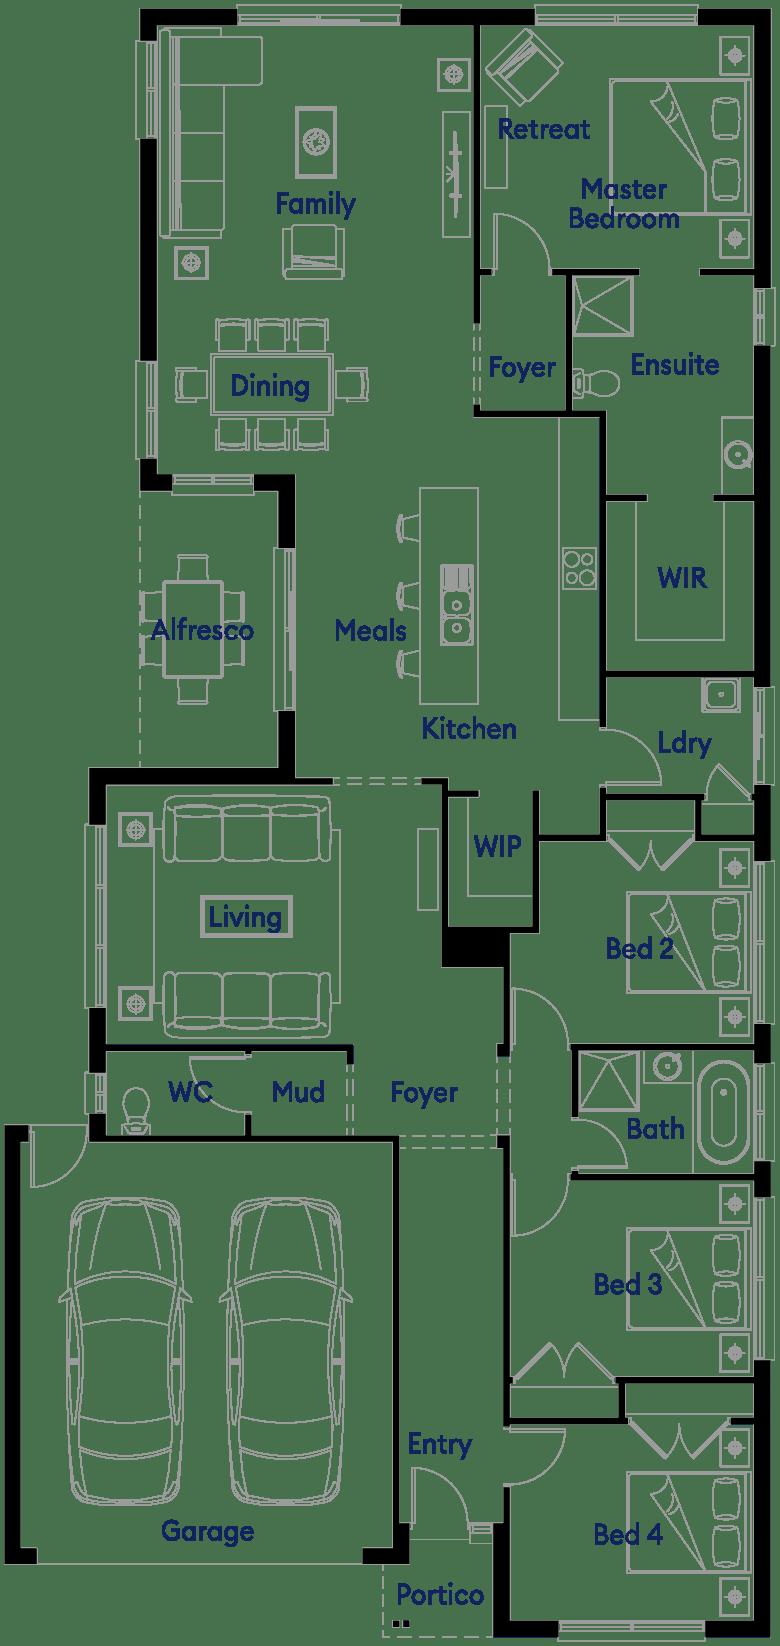 FloorPlan1_HOUSE766_Regal_26-1